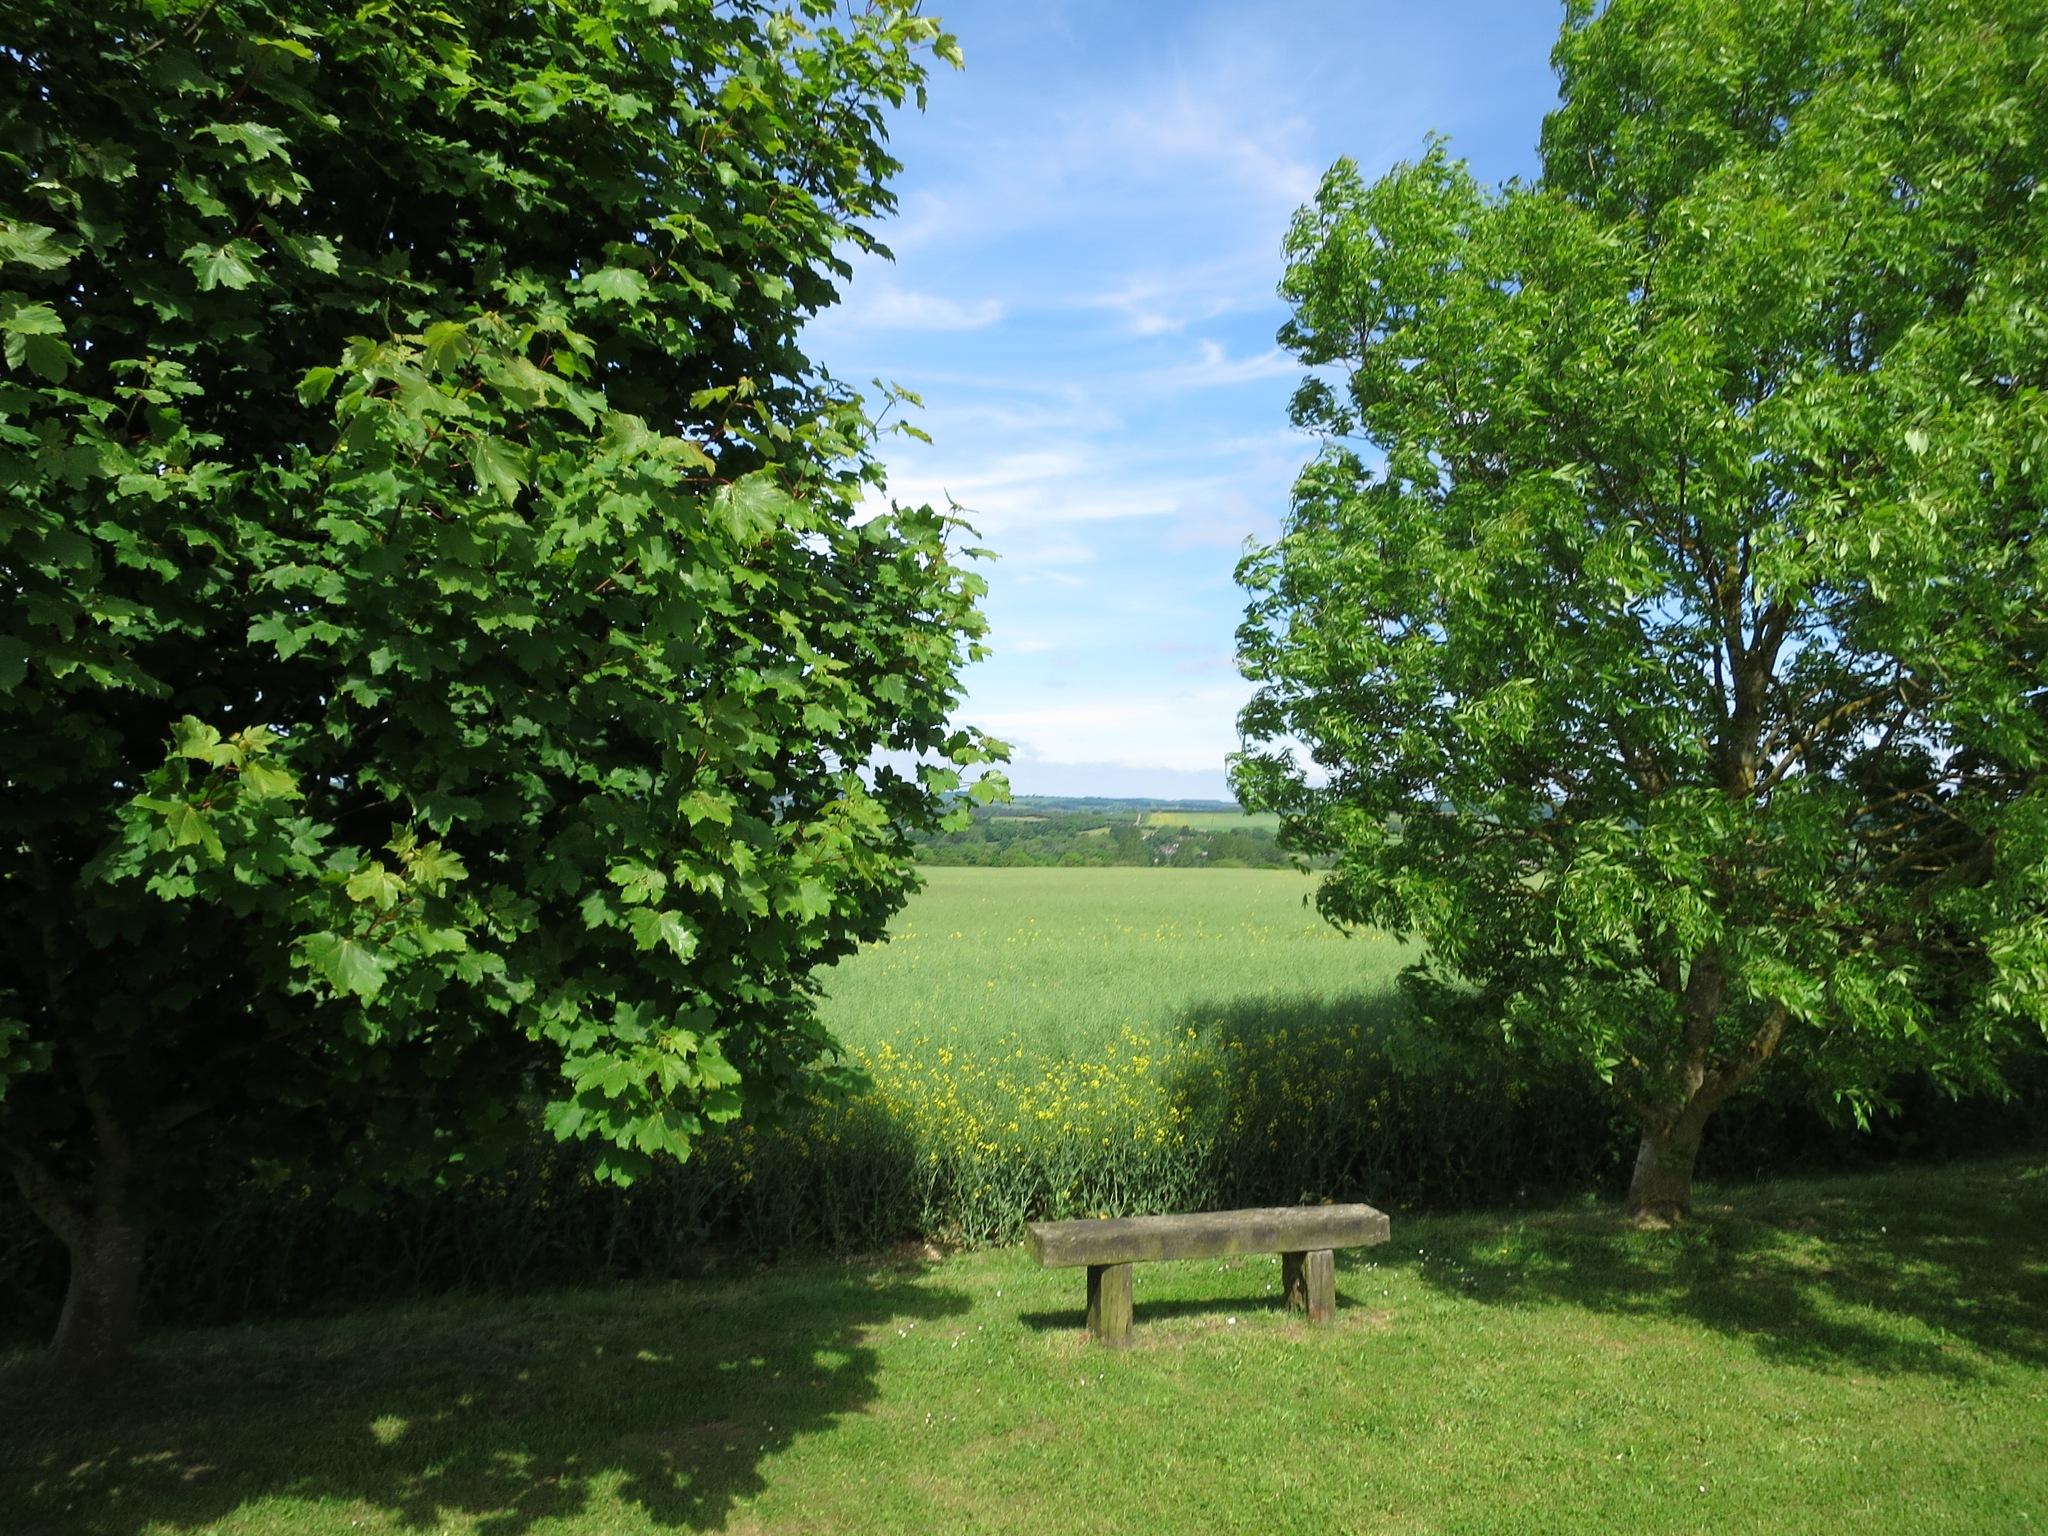 Lincolnshire Wolds 2 by GraemeLeePollard